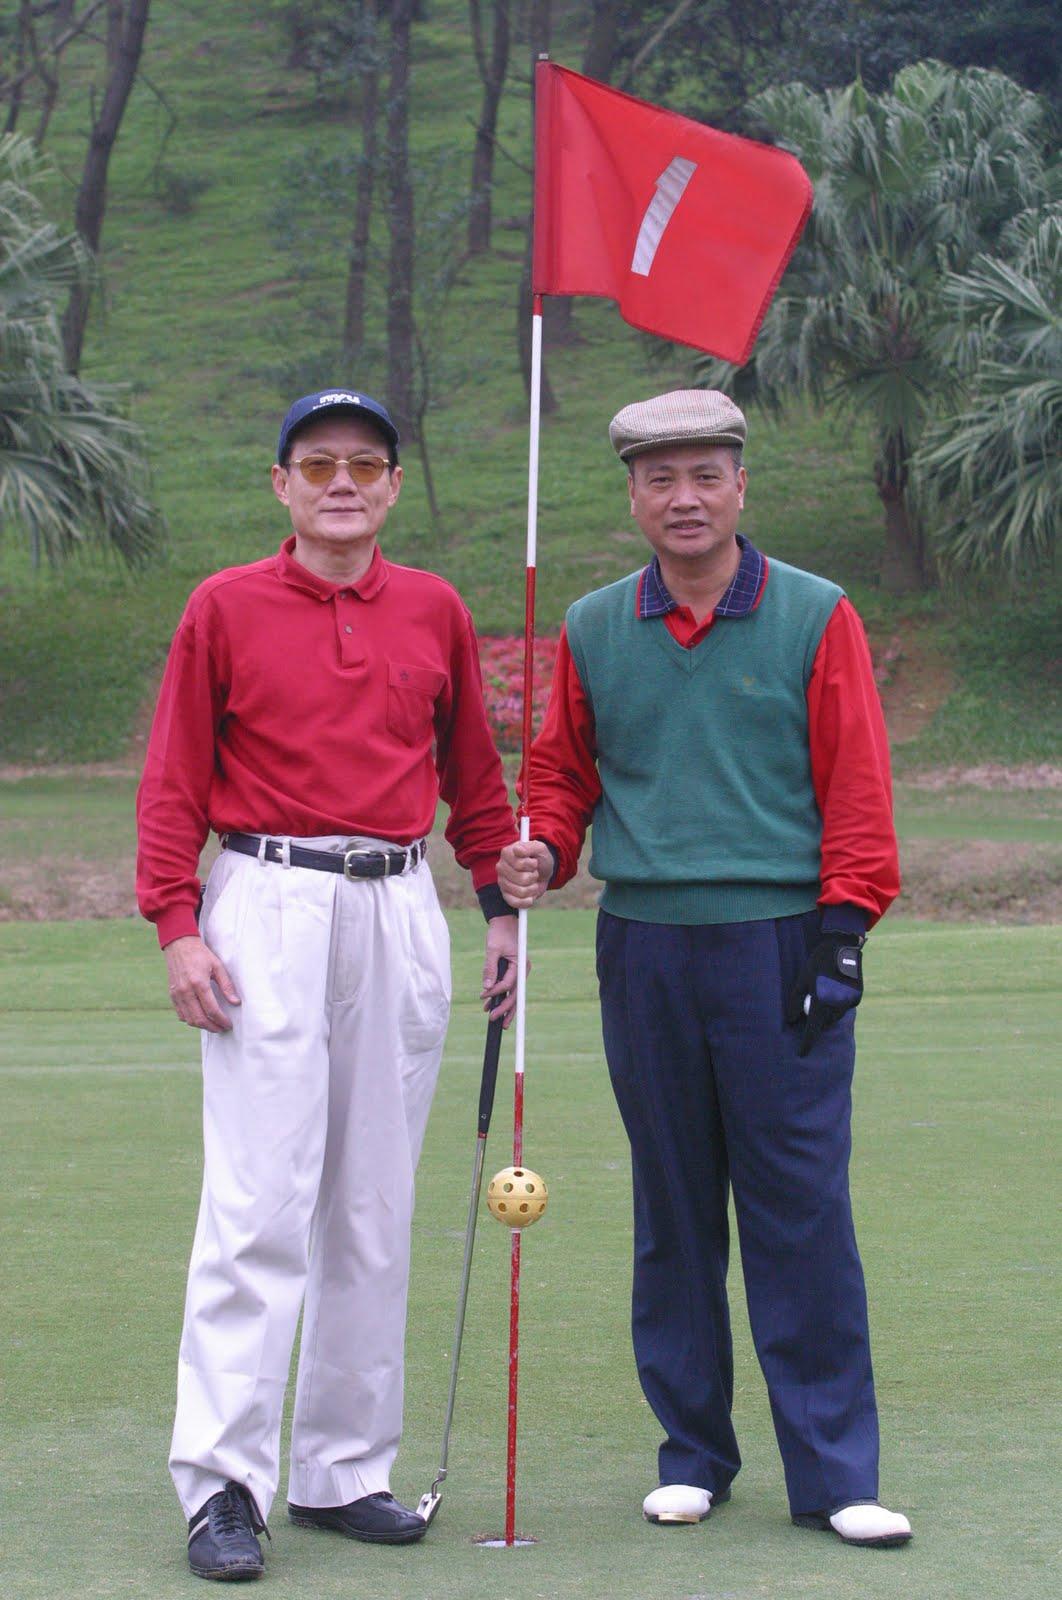 CTGA-Chinese Tempered Golf Association千錘百鍊高爾夫協會: 學習高爾夫球之挑戰與突破